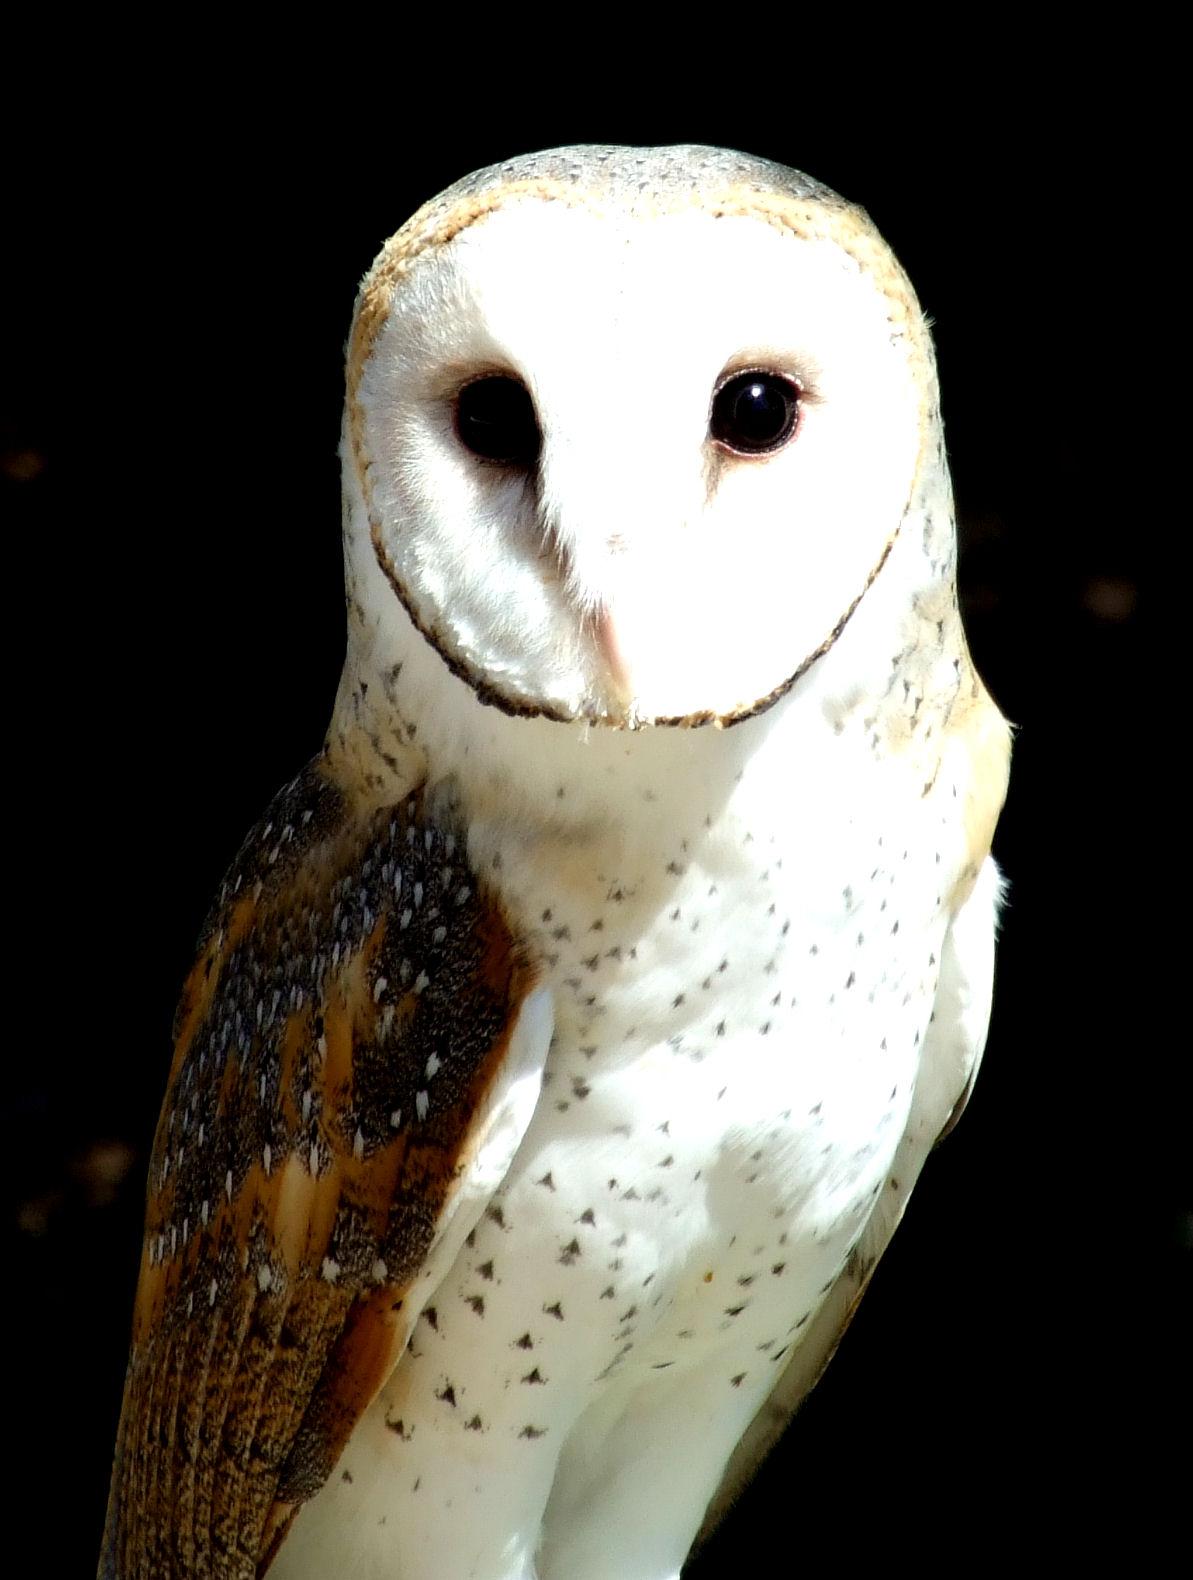 openphotonet_barn owl